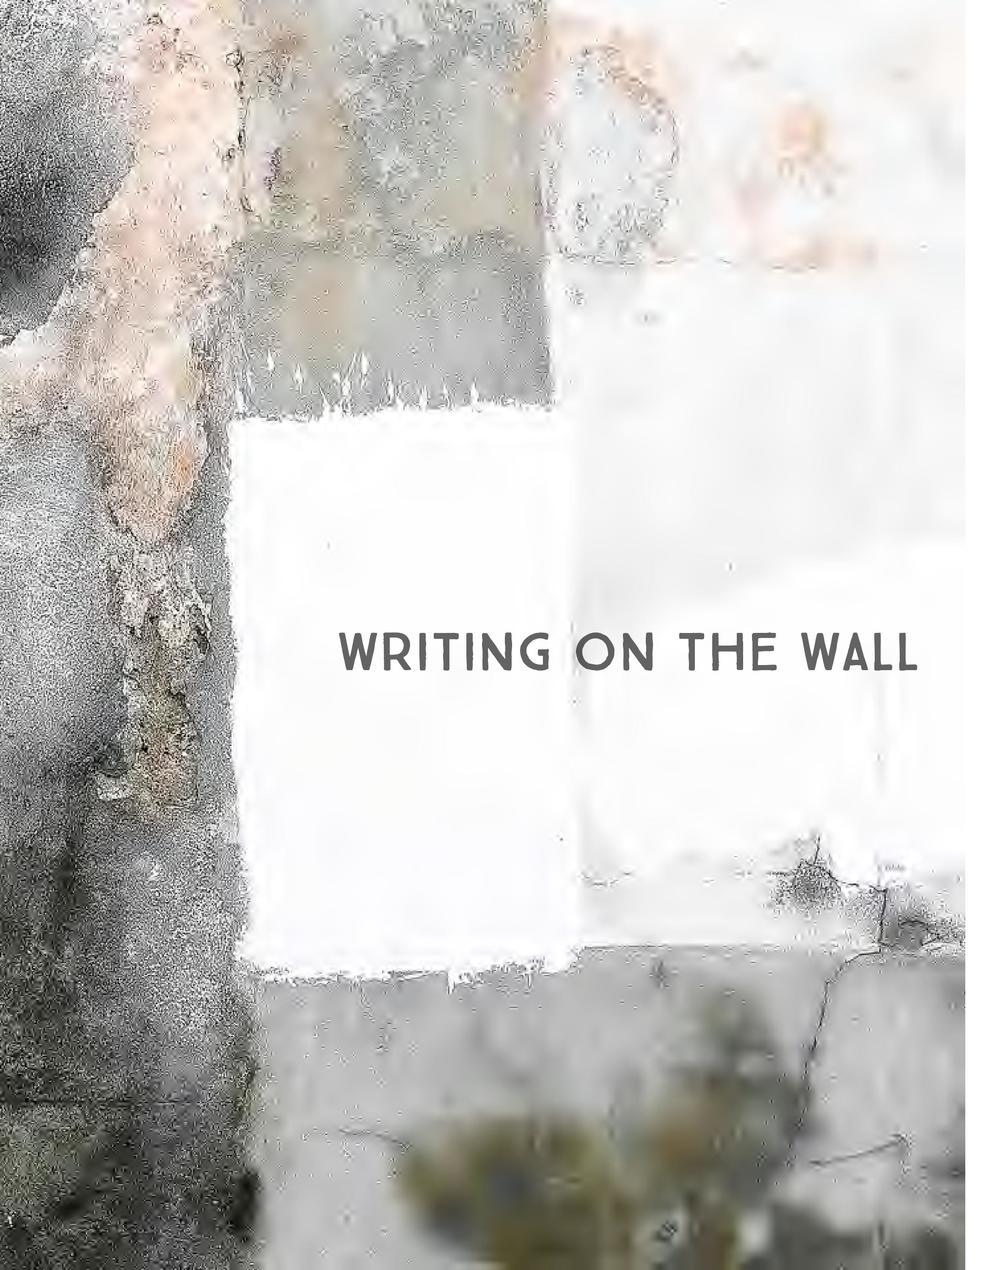 WritingOnWall-Catalog-HEYDT-email-page-005.jpg